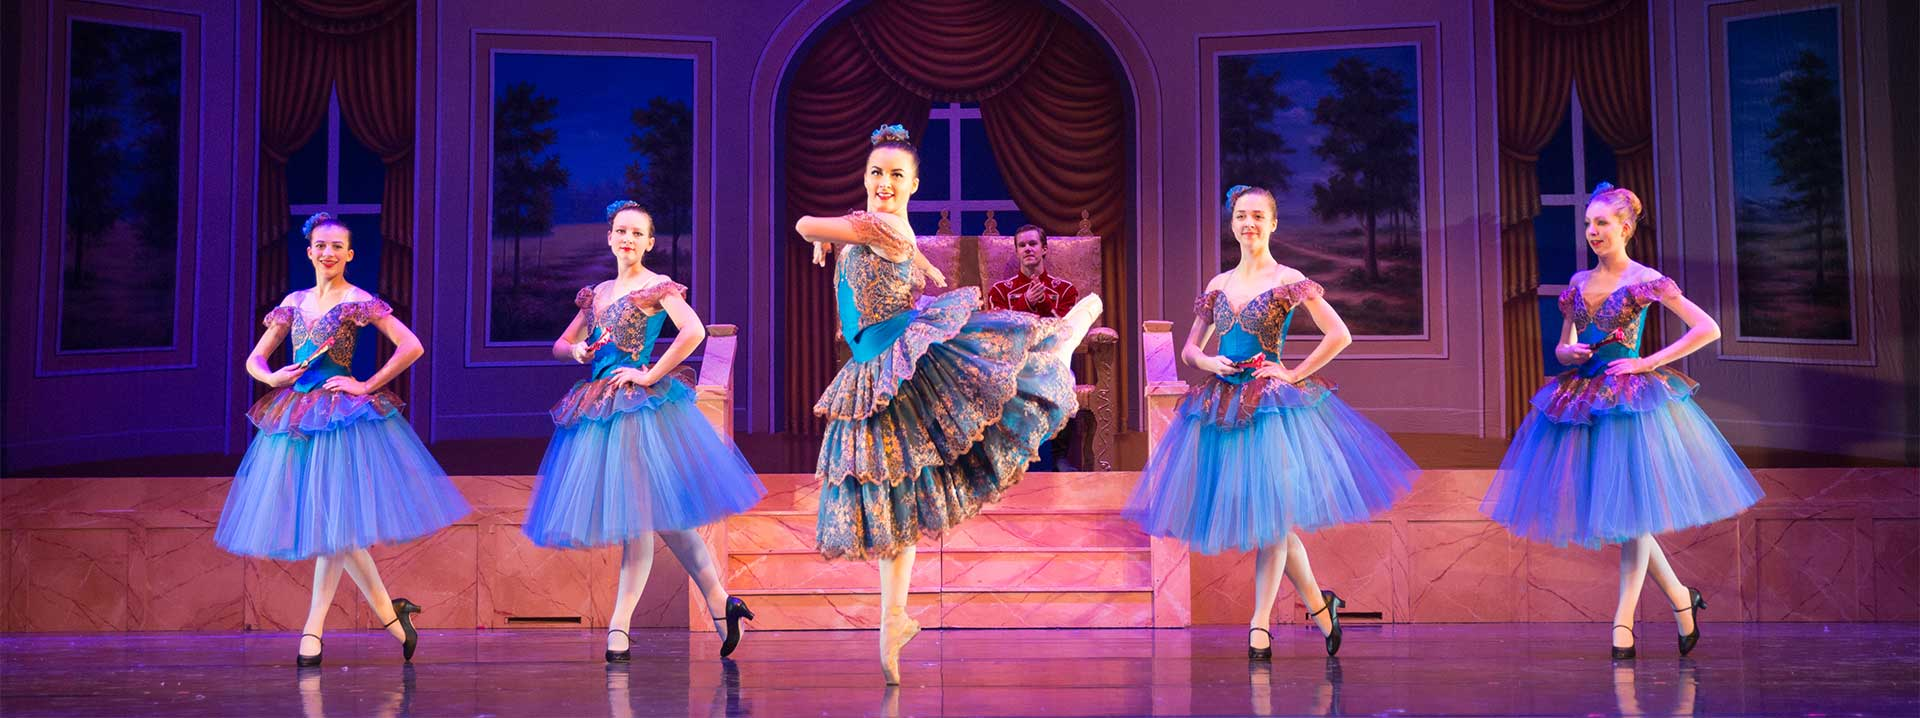 The Nutcracker Garden City Ballet FAQs - dancers on stage